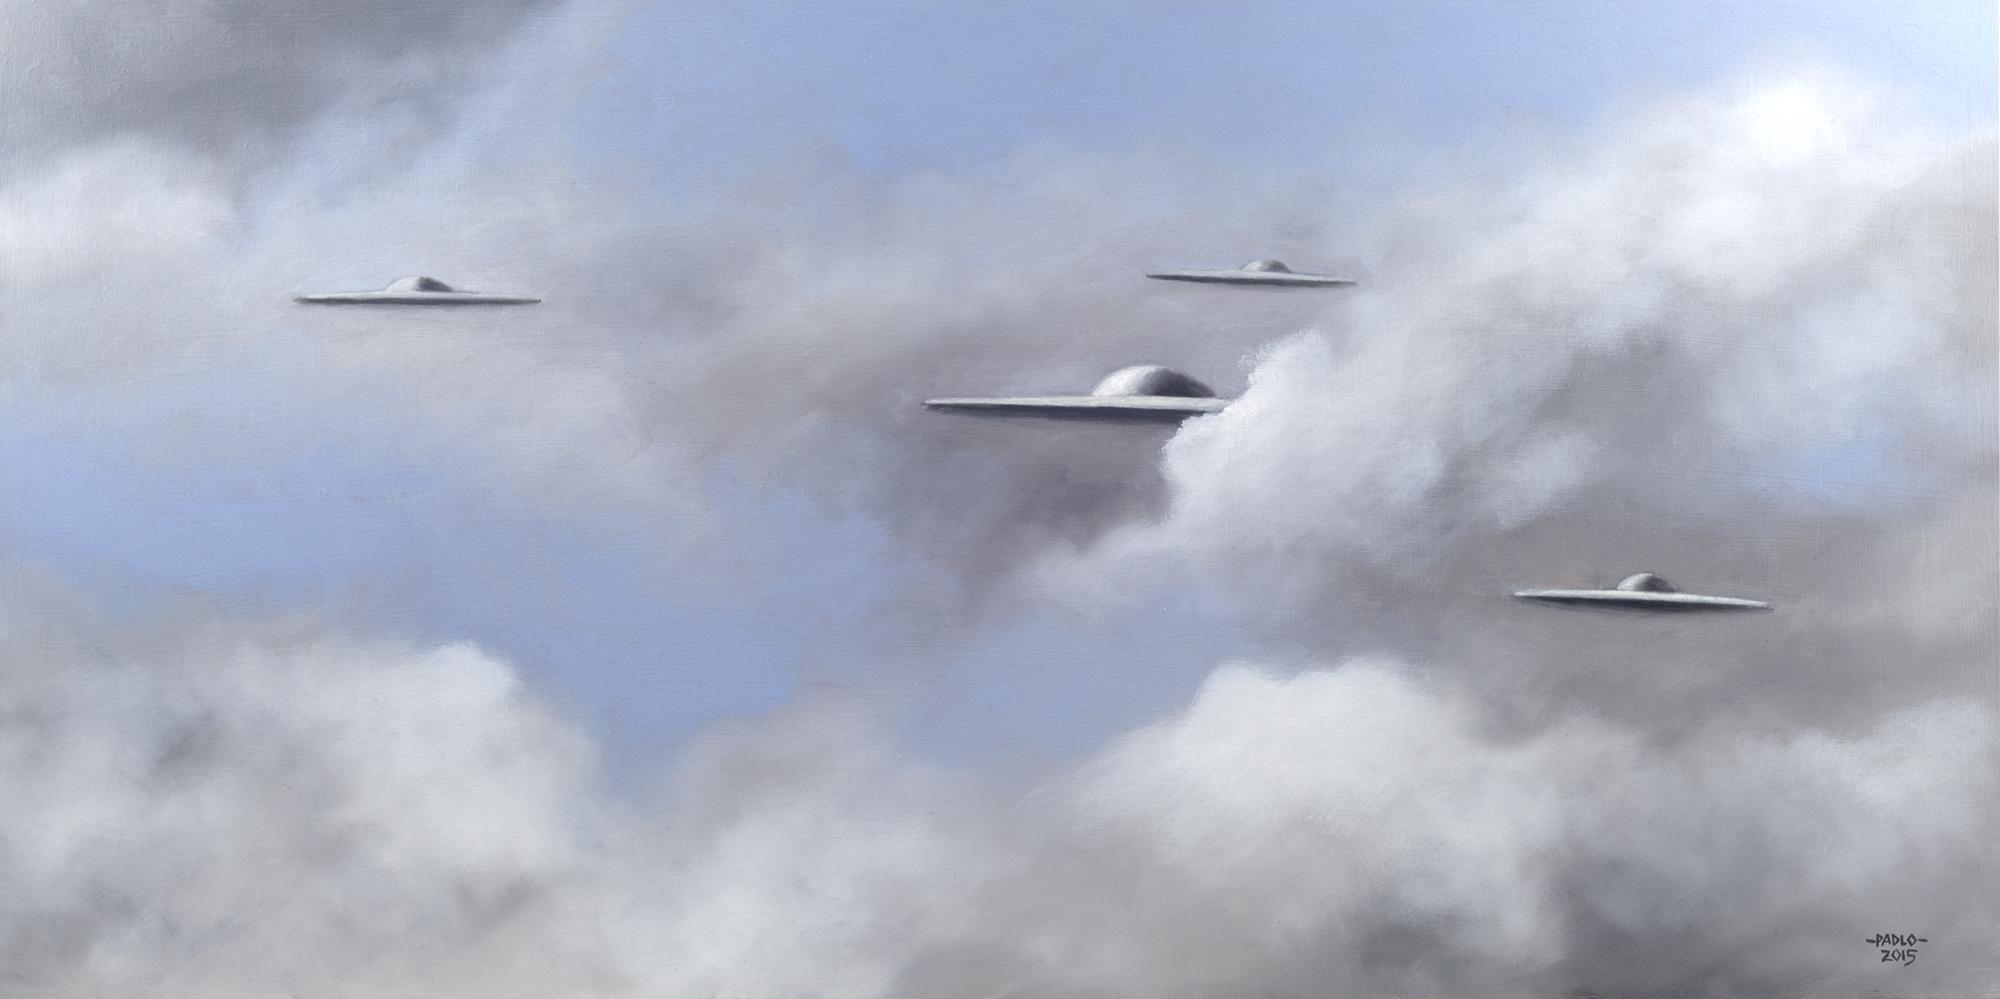 UFO SIGHTING 37